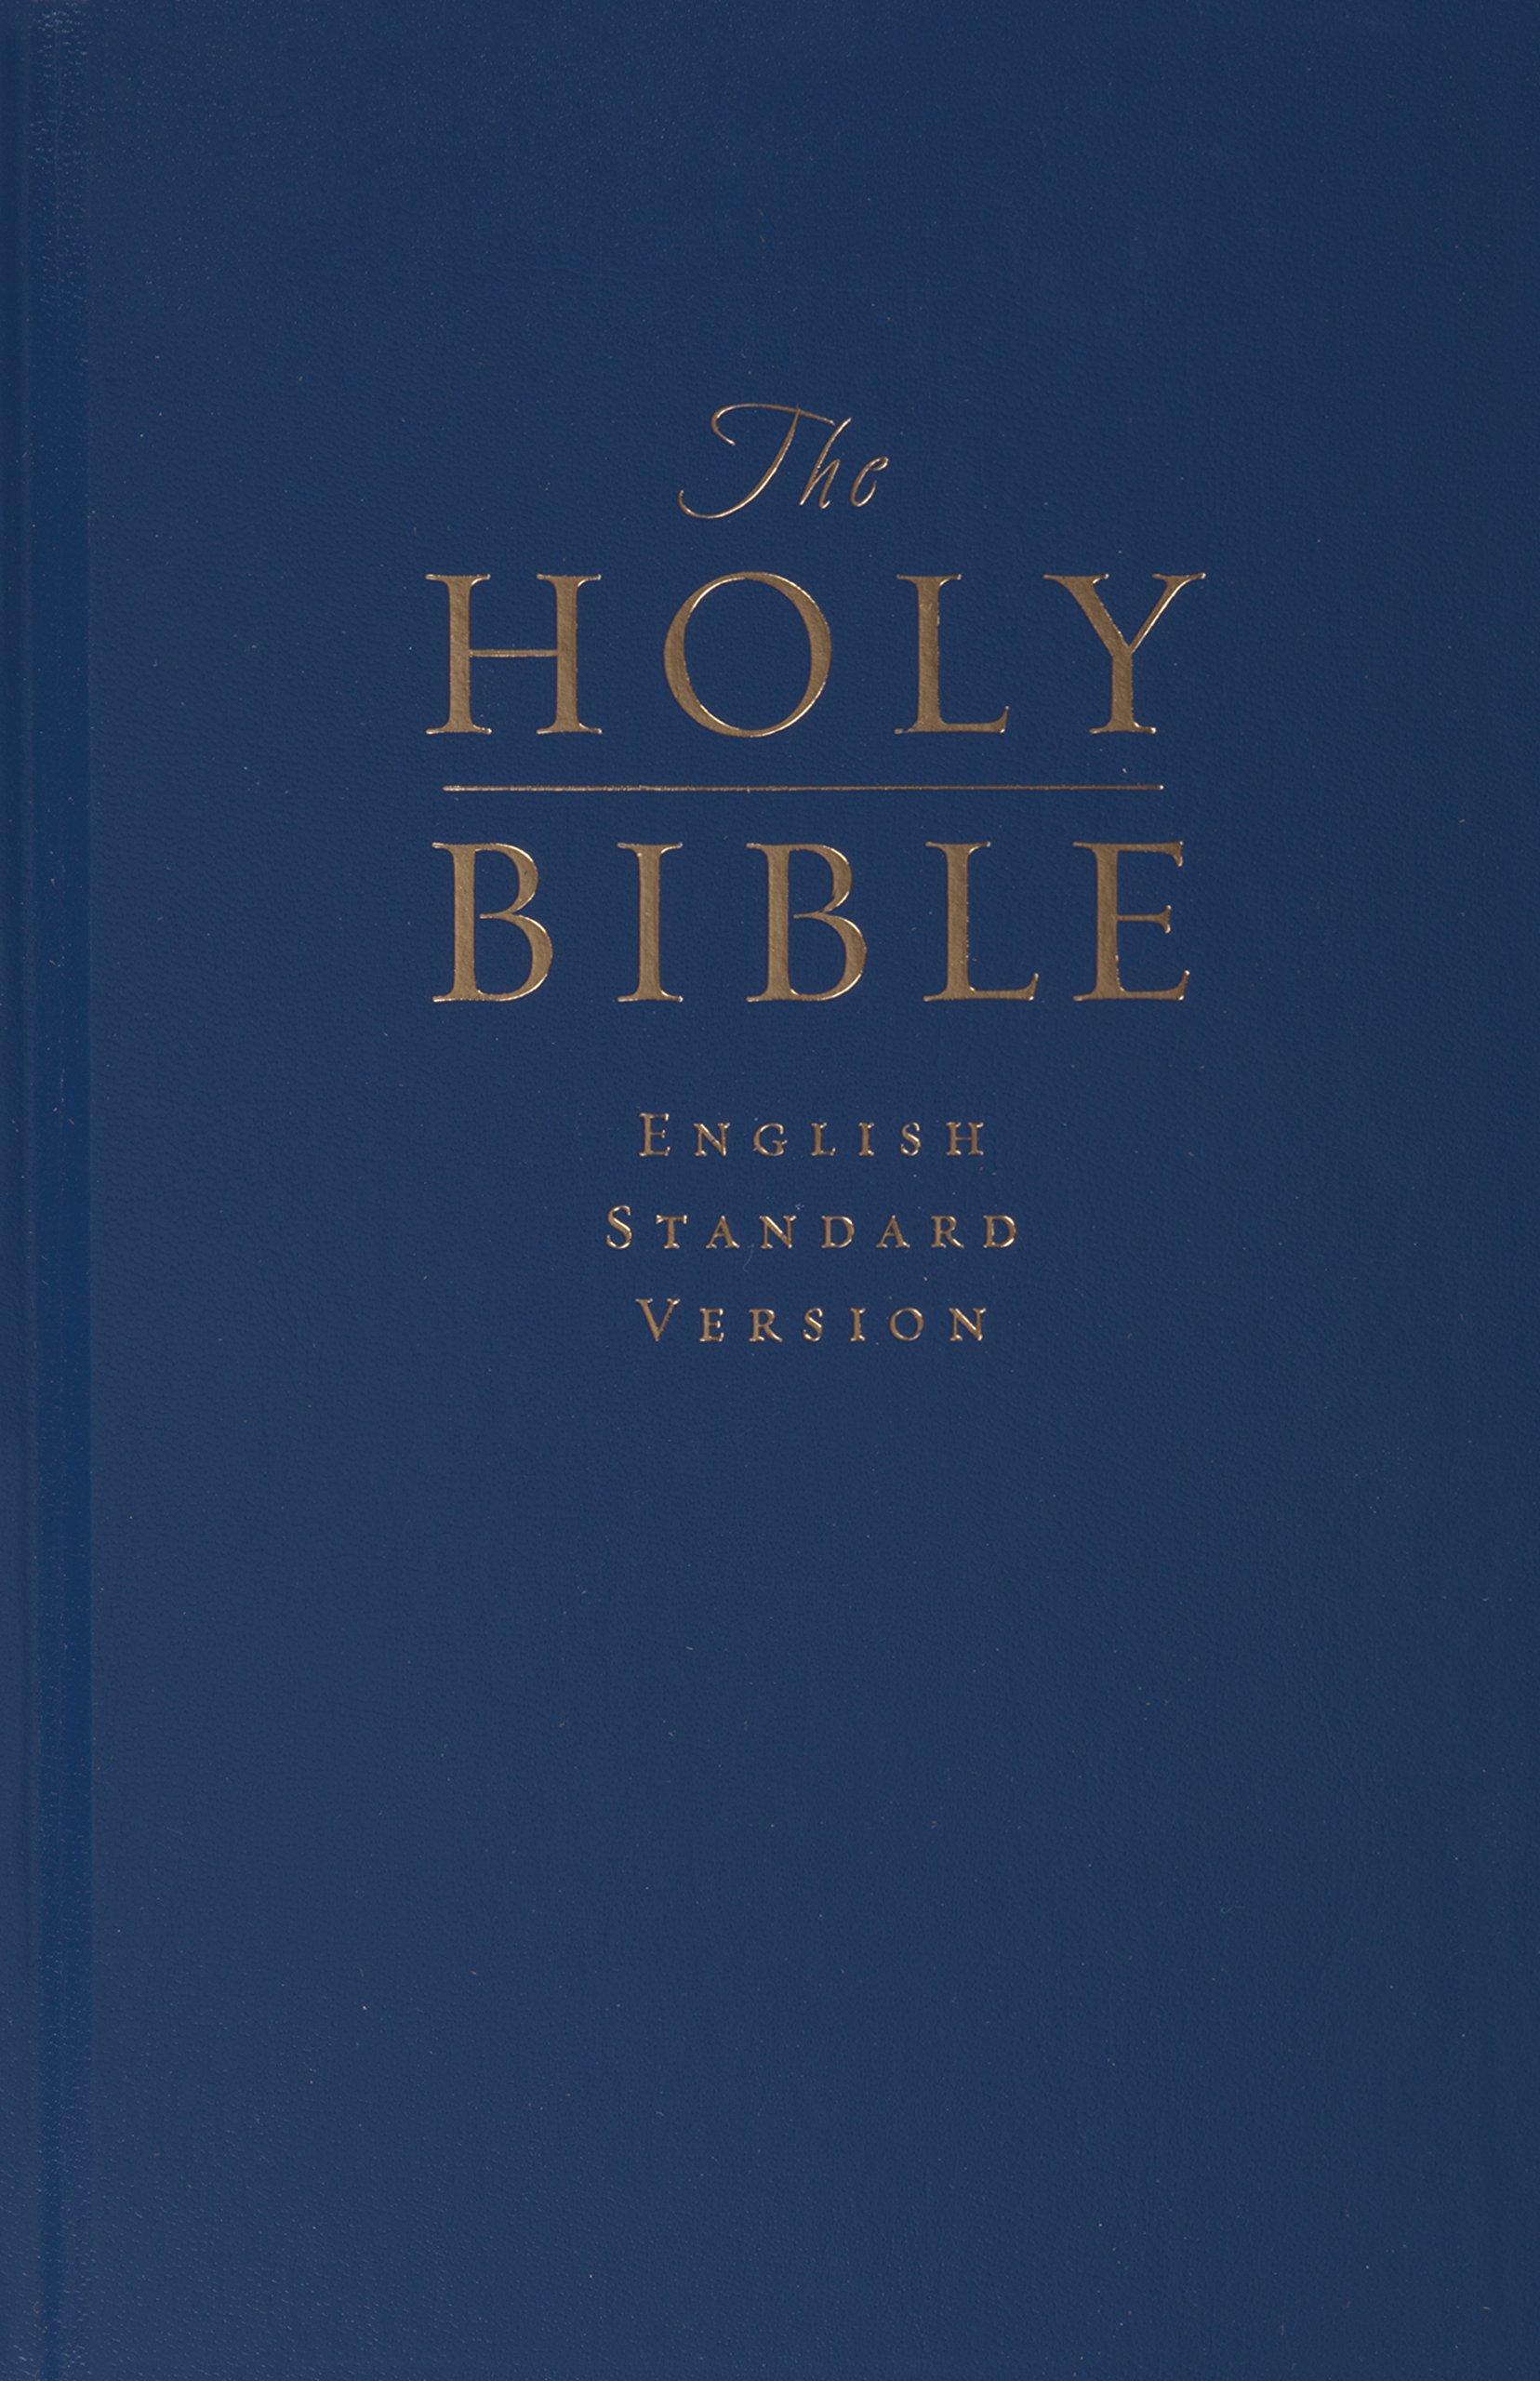 Holy Bible English Standard Version product image